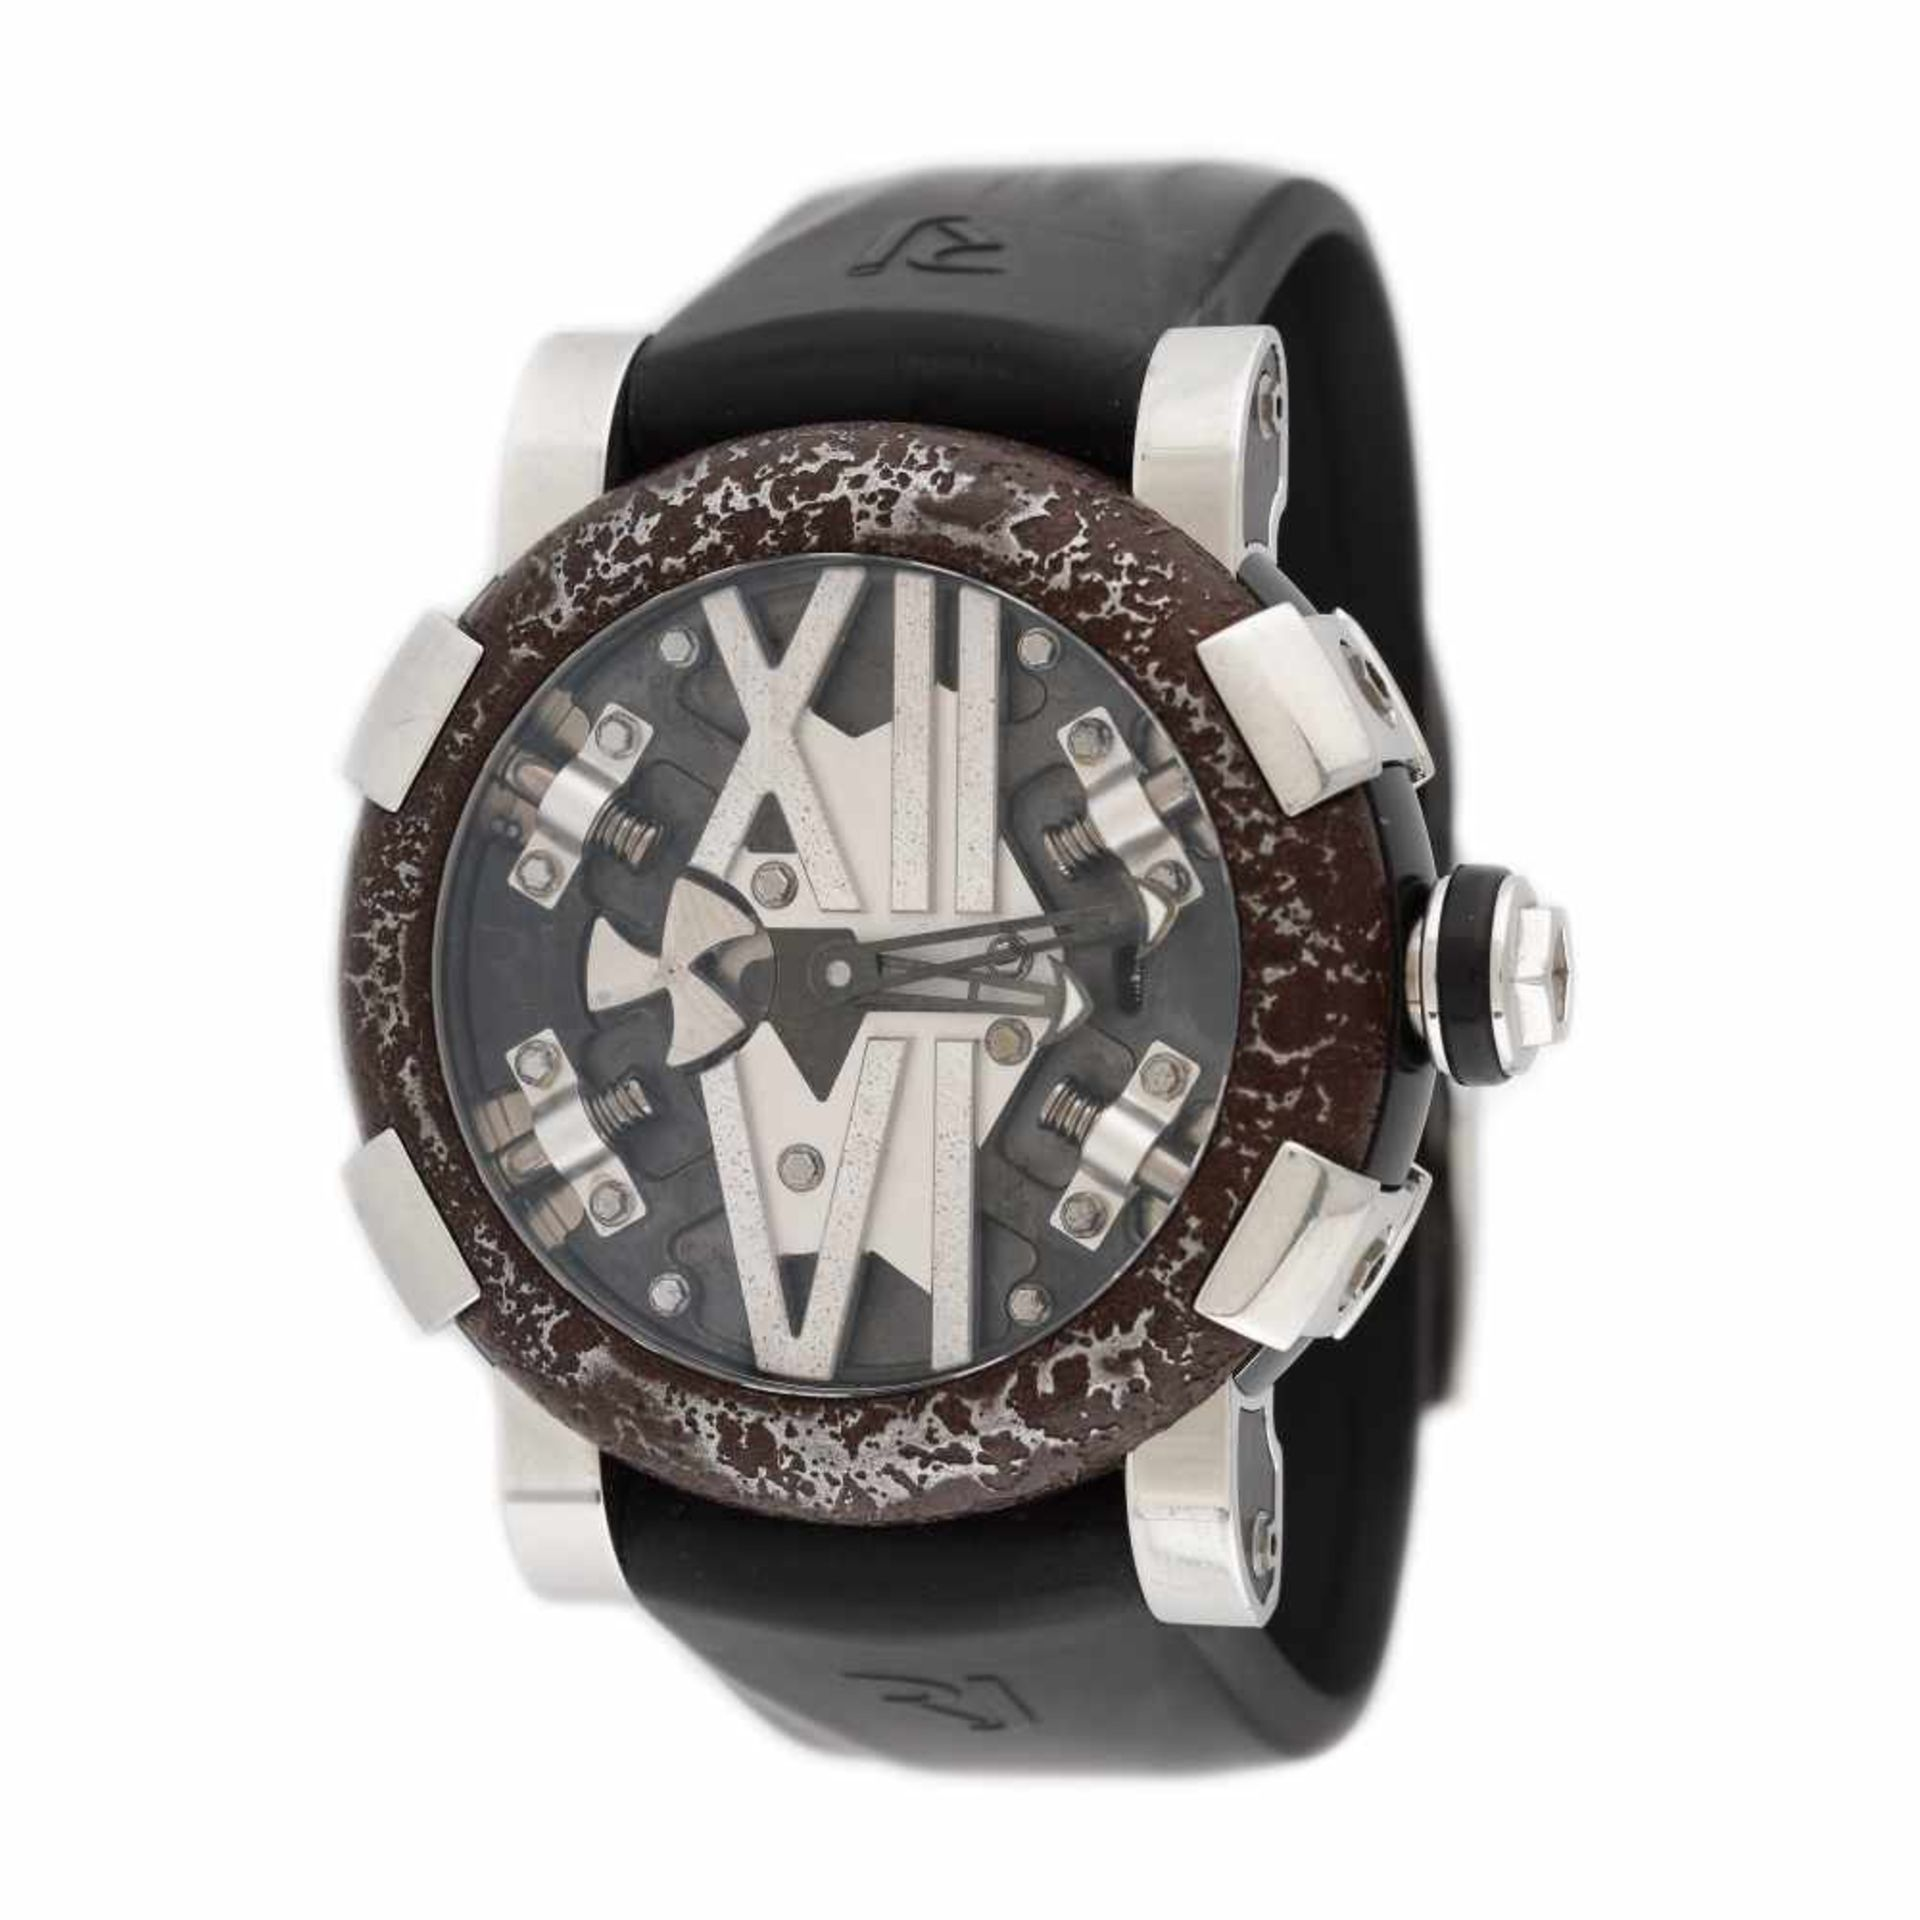 Romain Jerome Titanic-DNA wristwatch, men